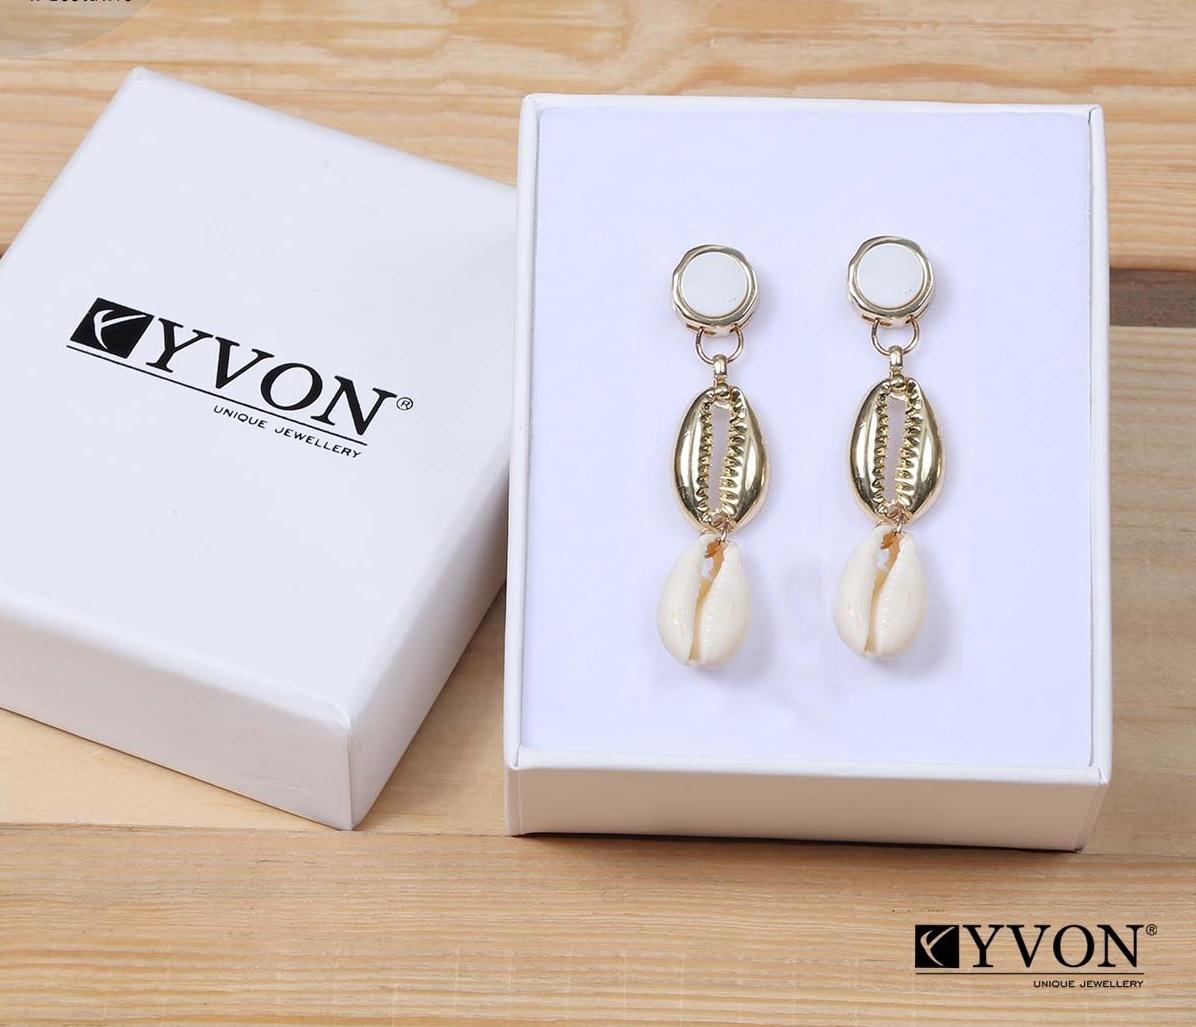 Dámske visiace bielo-zlaté mušľové náušnice Yvon